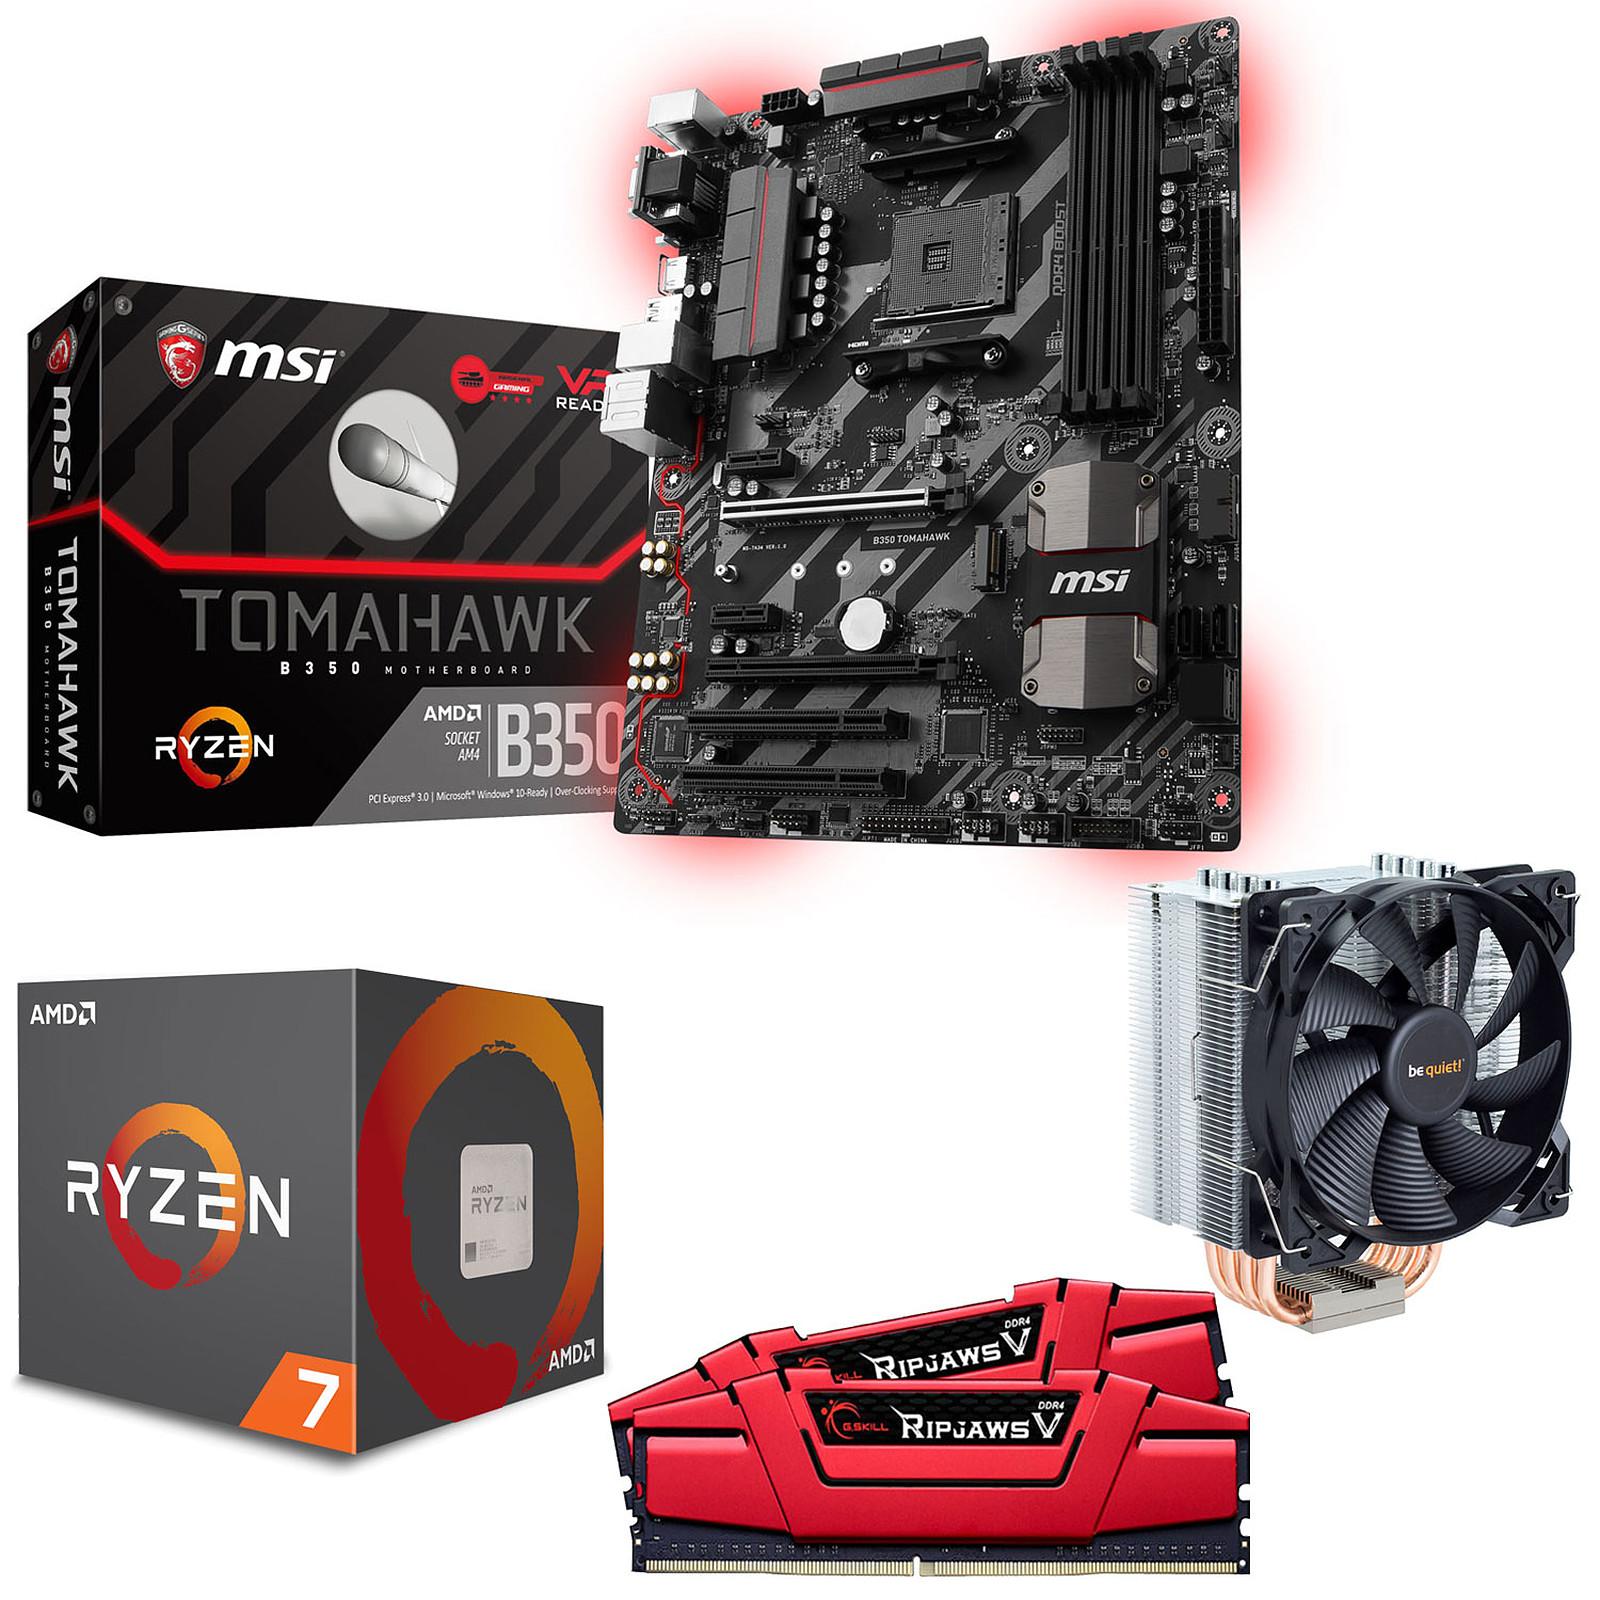 Kit Upgrade PC AMD Ryzen 7 1700X MSI B350 TOMAHAWK 16 Go